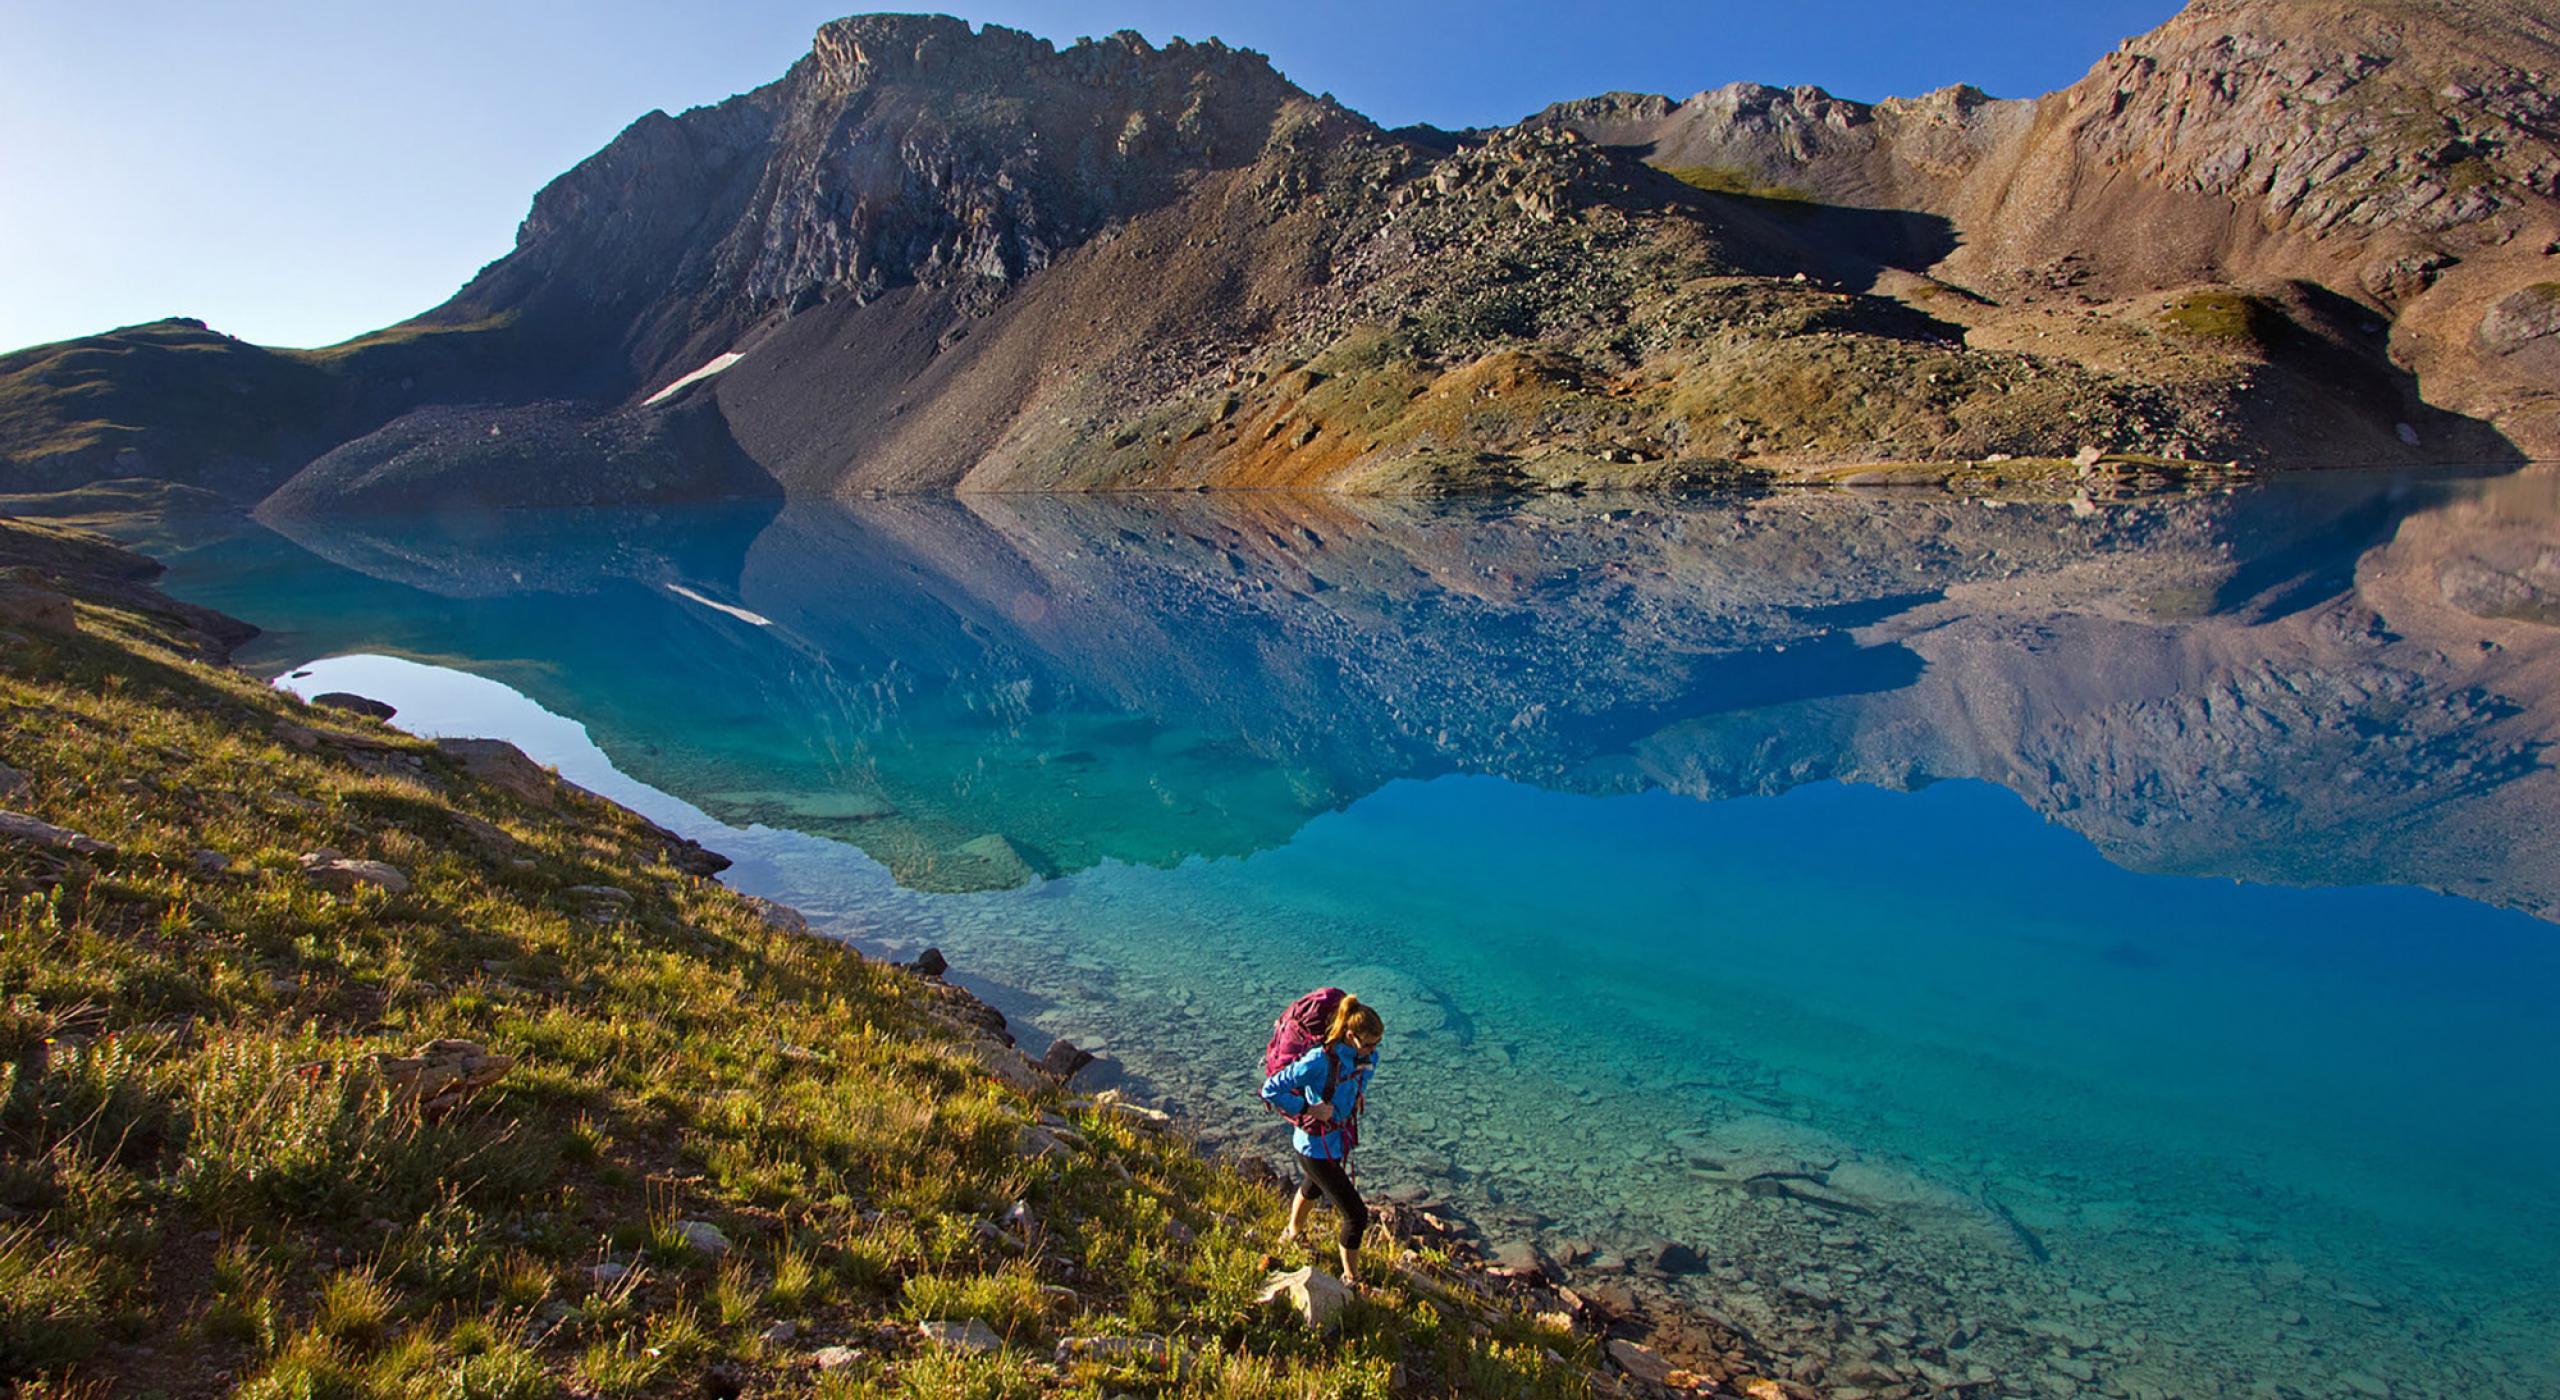 telluride colorado best activities to do visit the usa telluride colorado best activities to